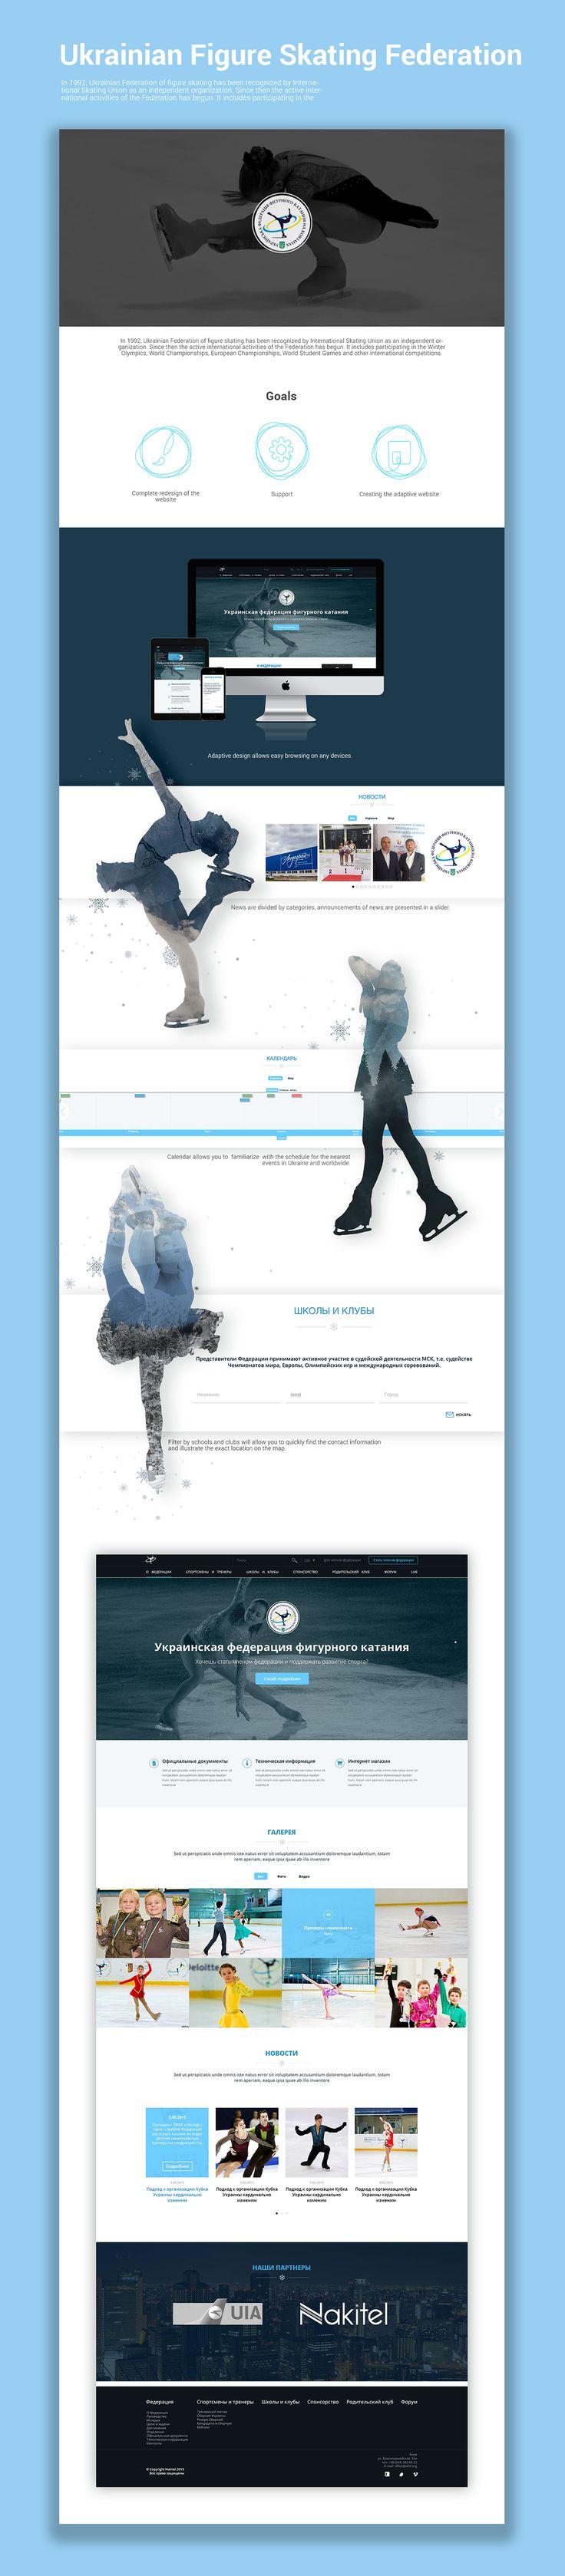 Ukrainian Figure Skating Federation Website on Behance